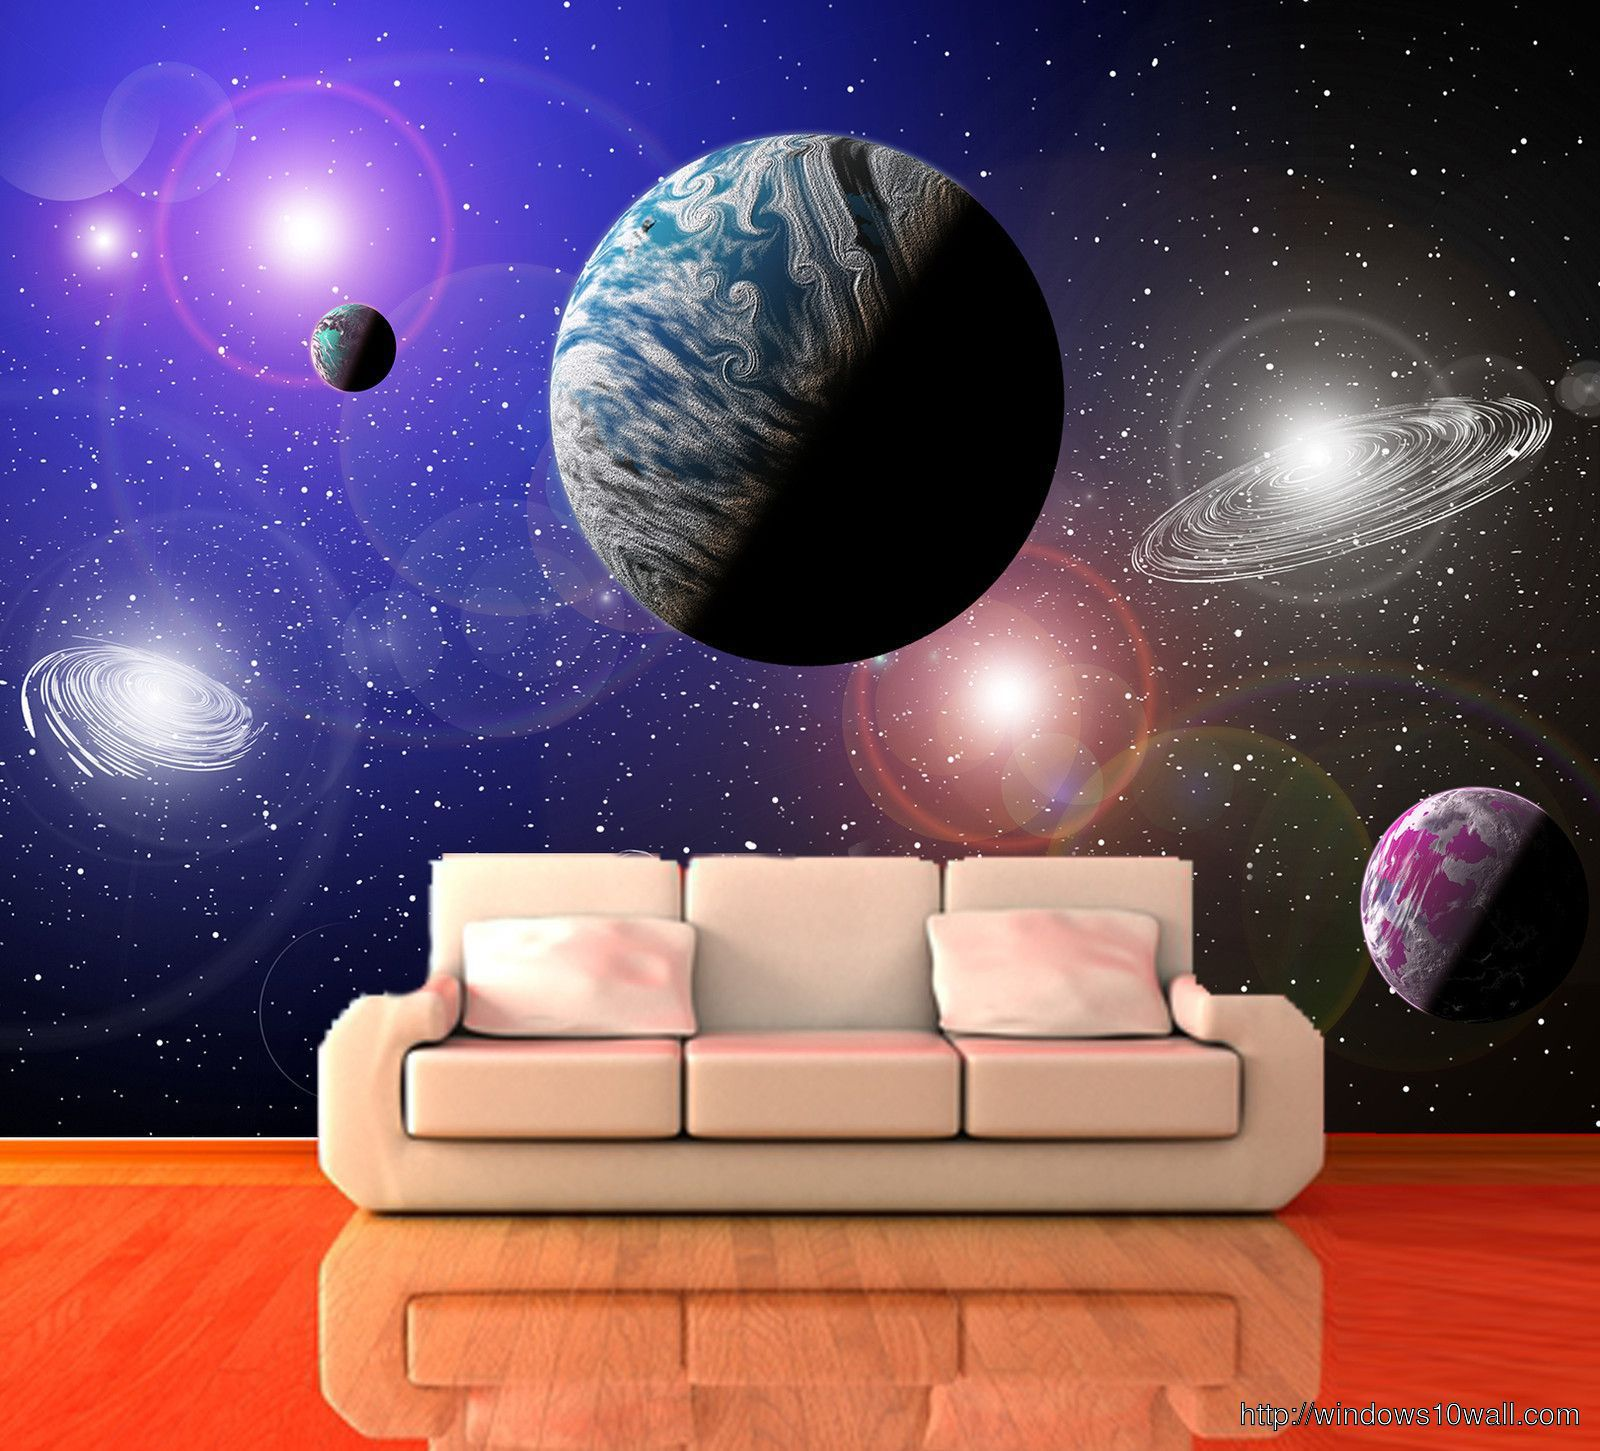 Universe Decorating Wallpaper for Bedroom